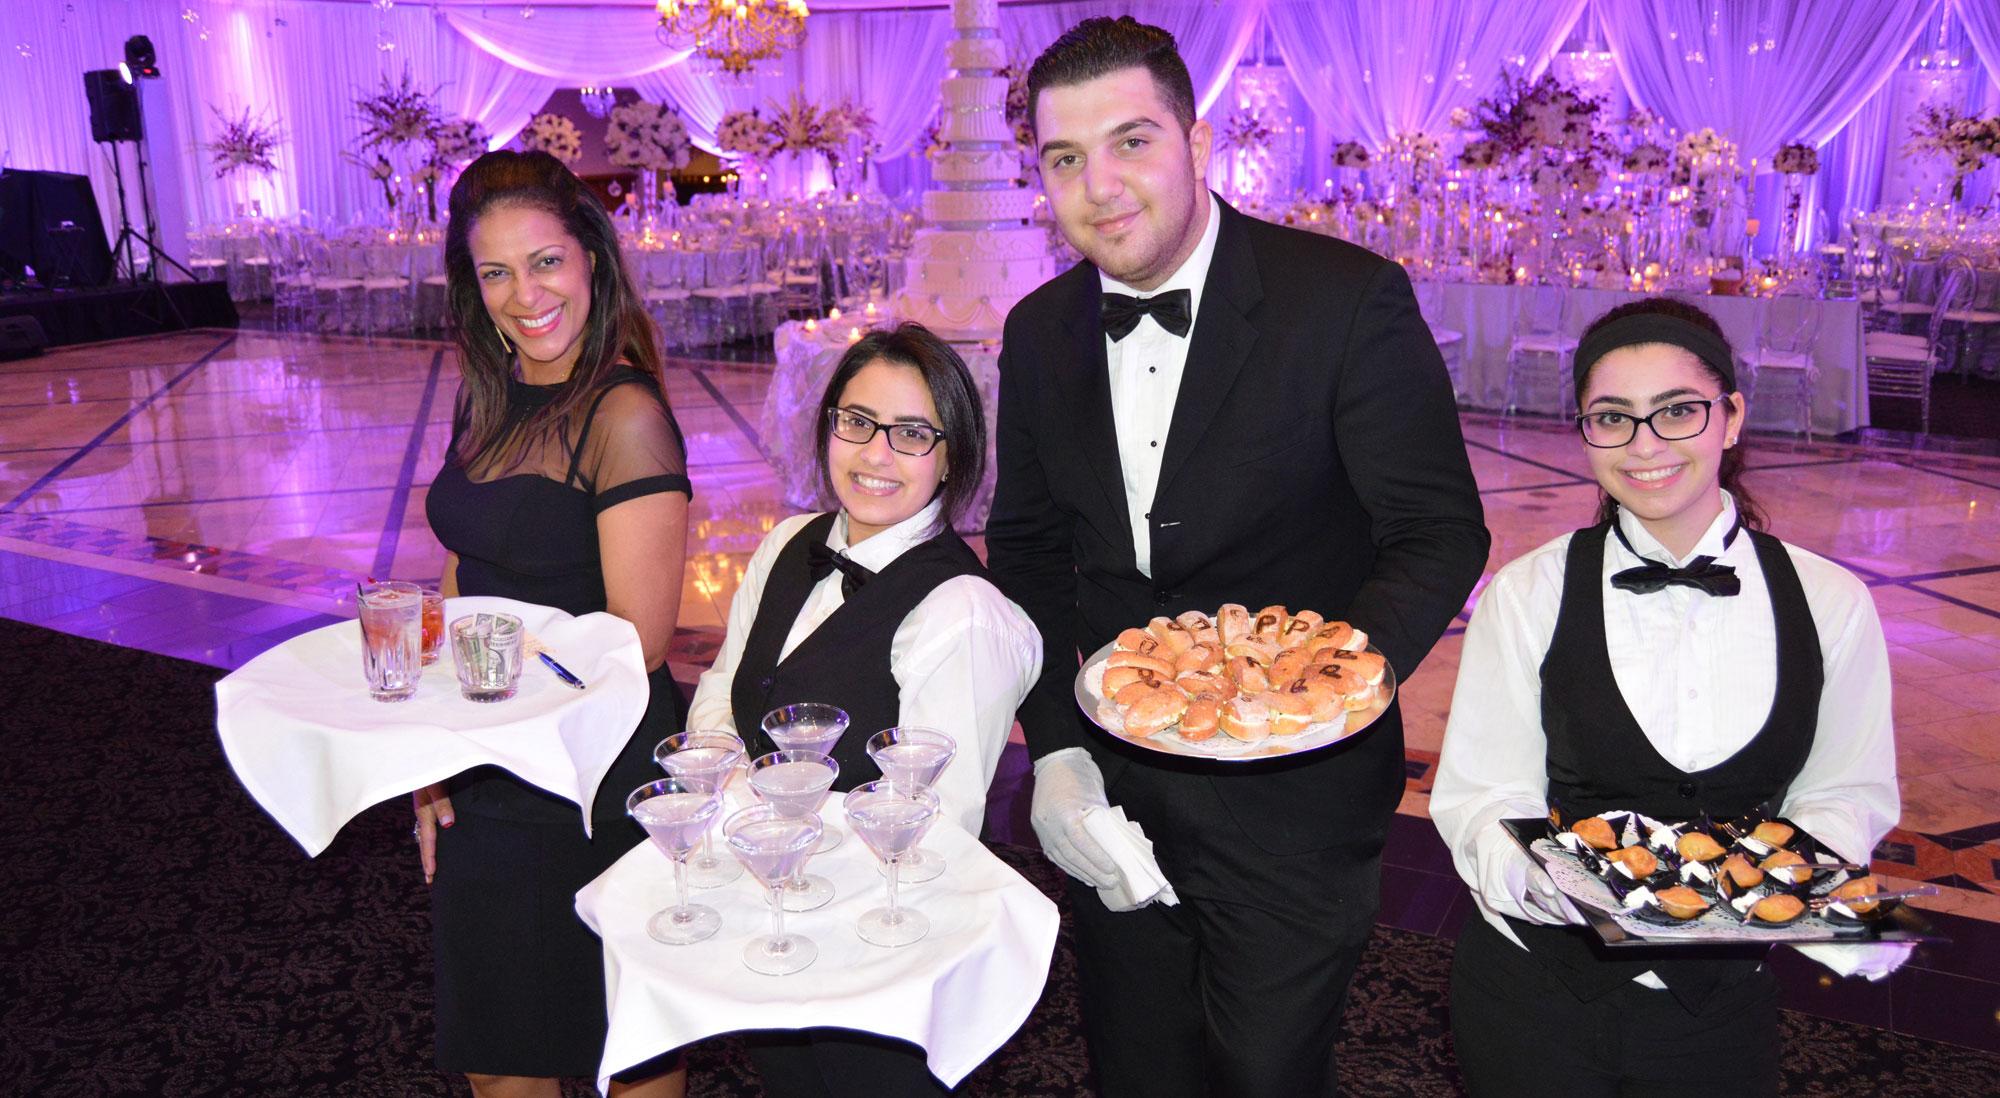 catering team at Petruzzello's